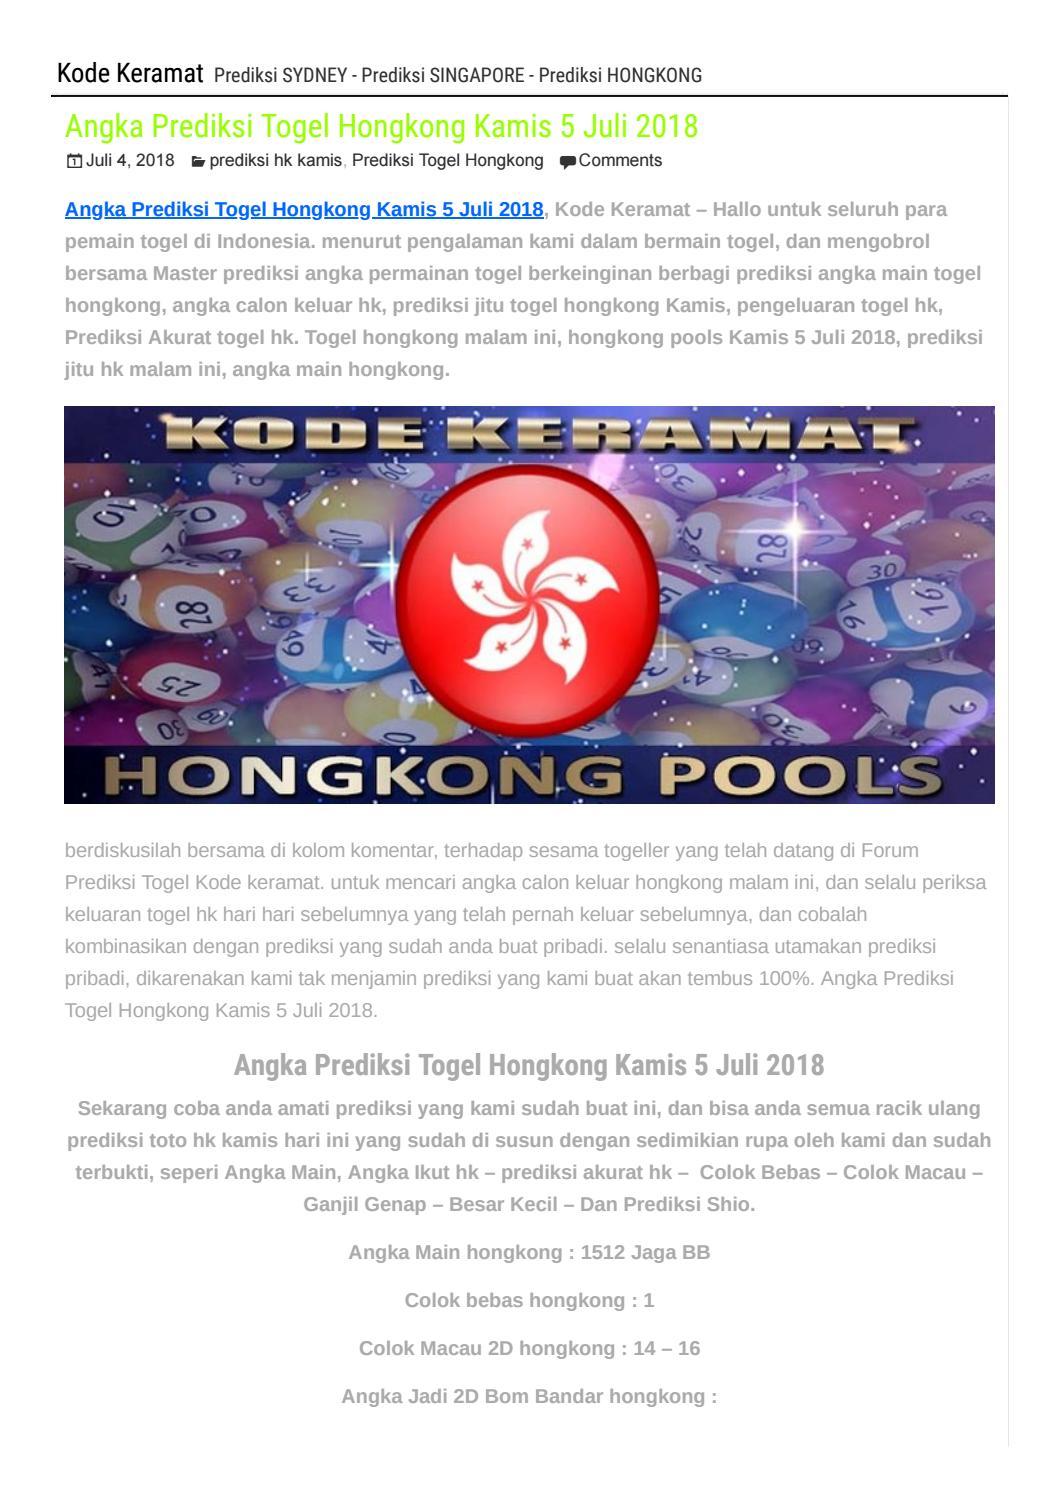 Prediksi Hk Master Hongkong Kamis : prediksi, master, hongkong, kamis, Angka, Prediksi, Togel, Hongkong, Kamis, Keramat, Adistia, Sasikirana, Issuu